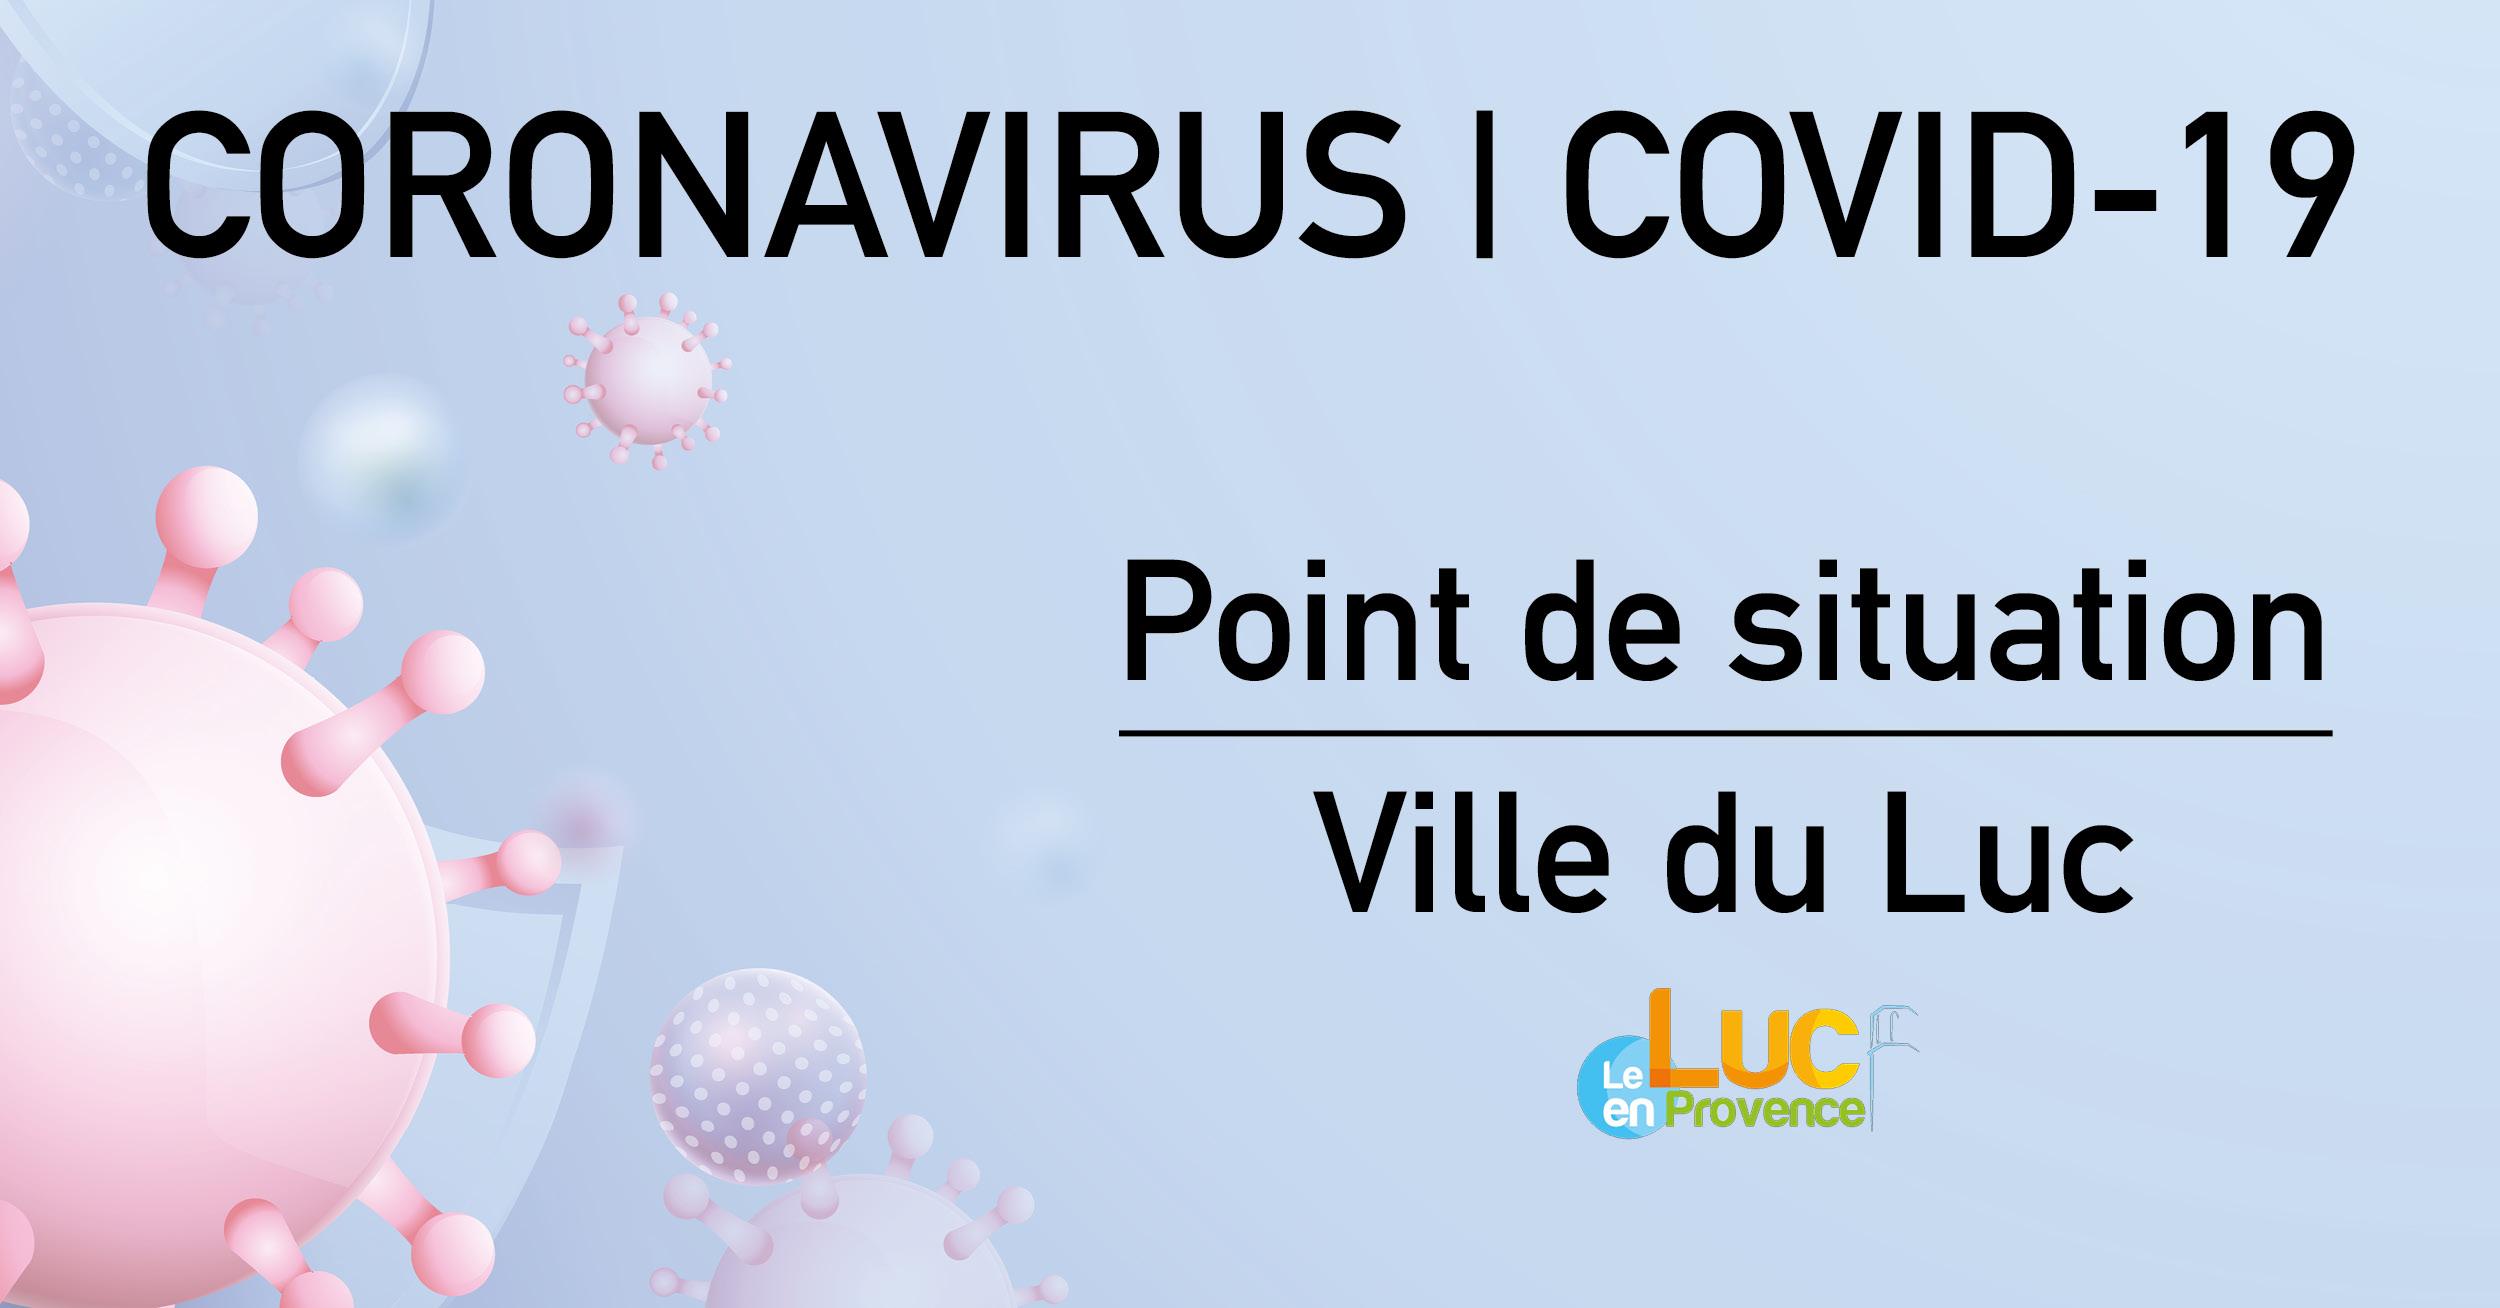 Coronavirus (Covid-19) : Point de situation du 25 mars 2020